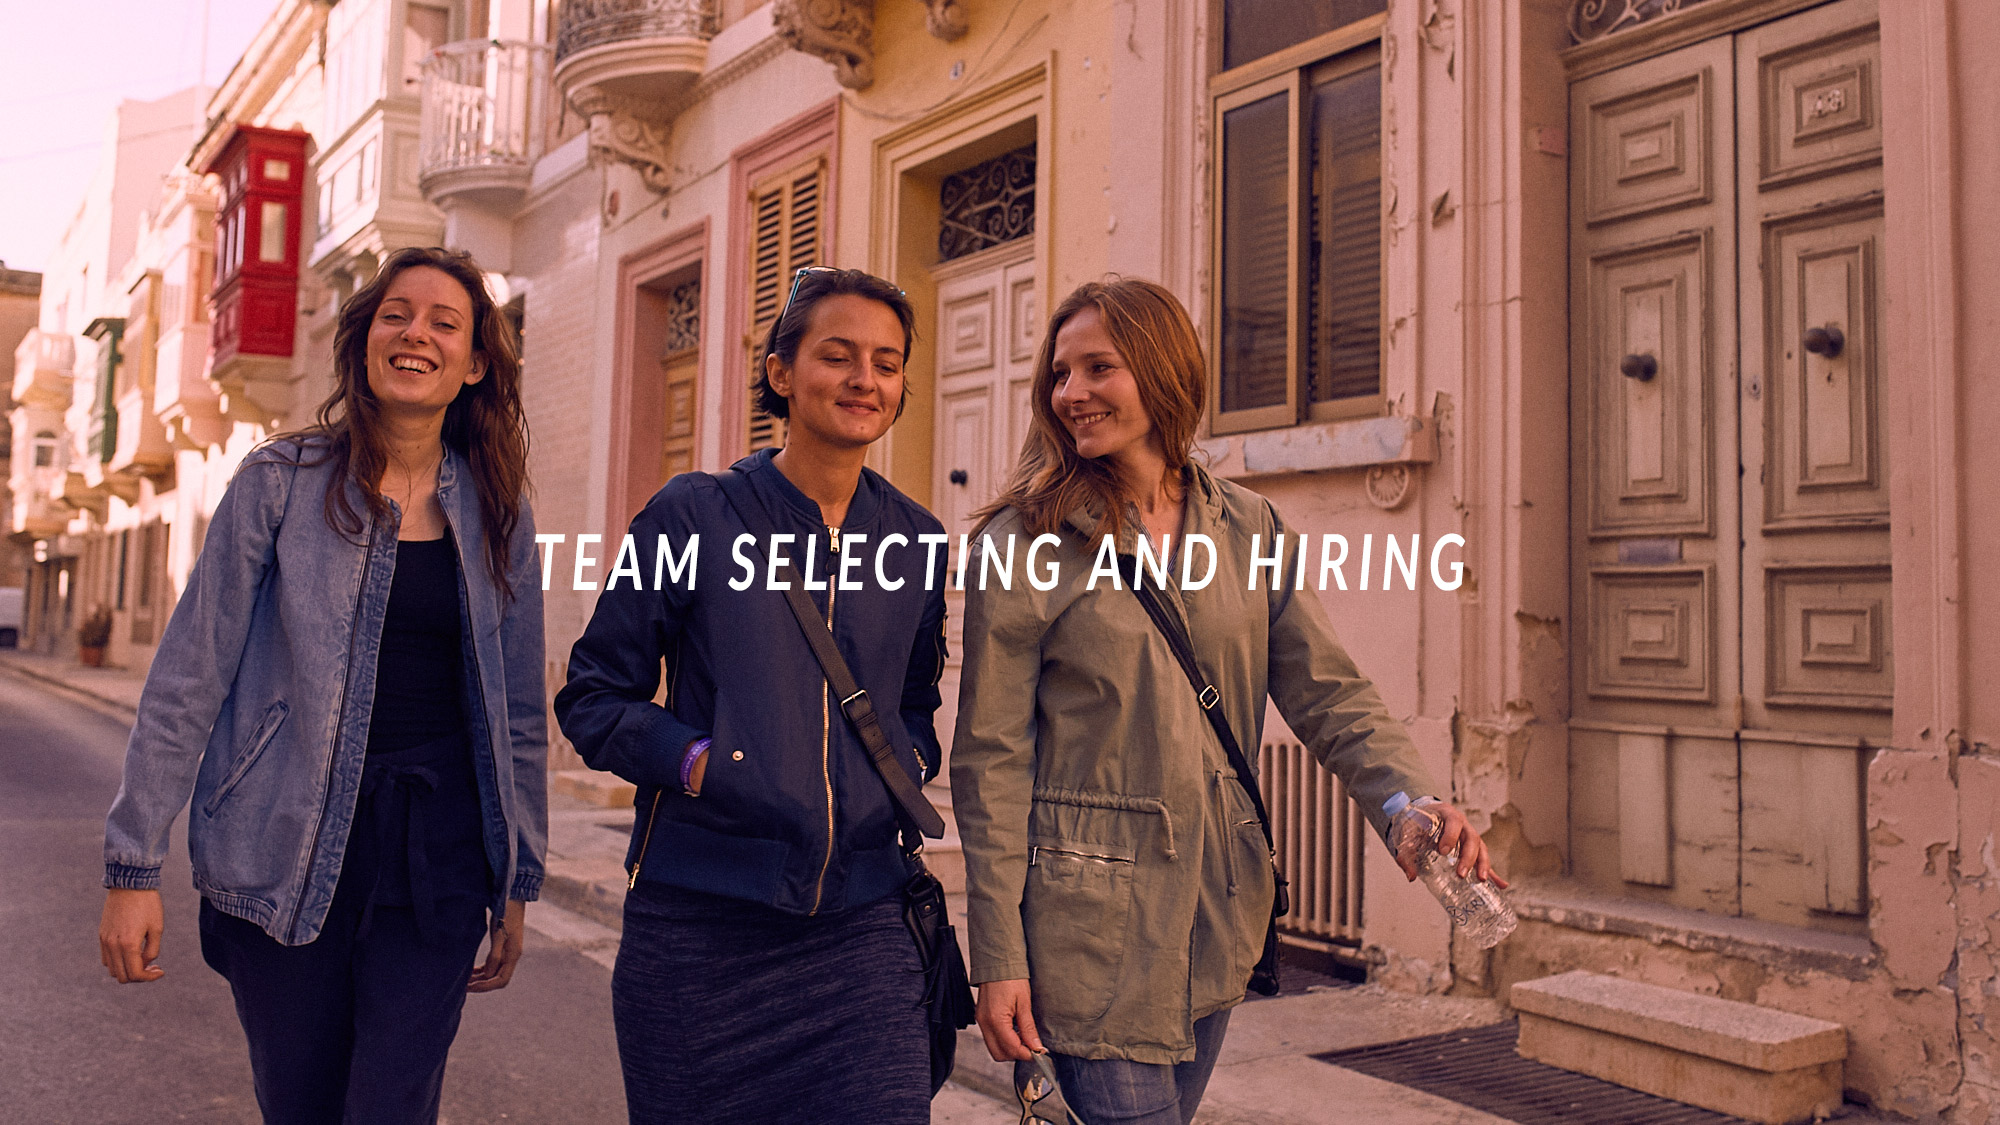 team selecting and hiring